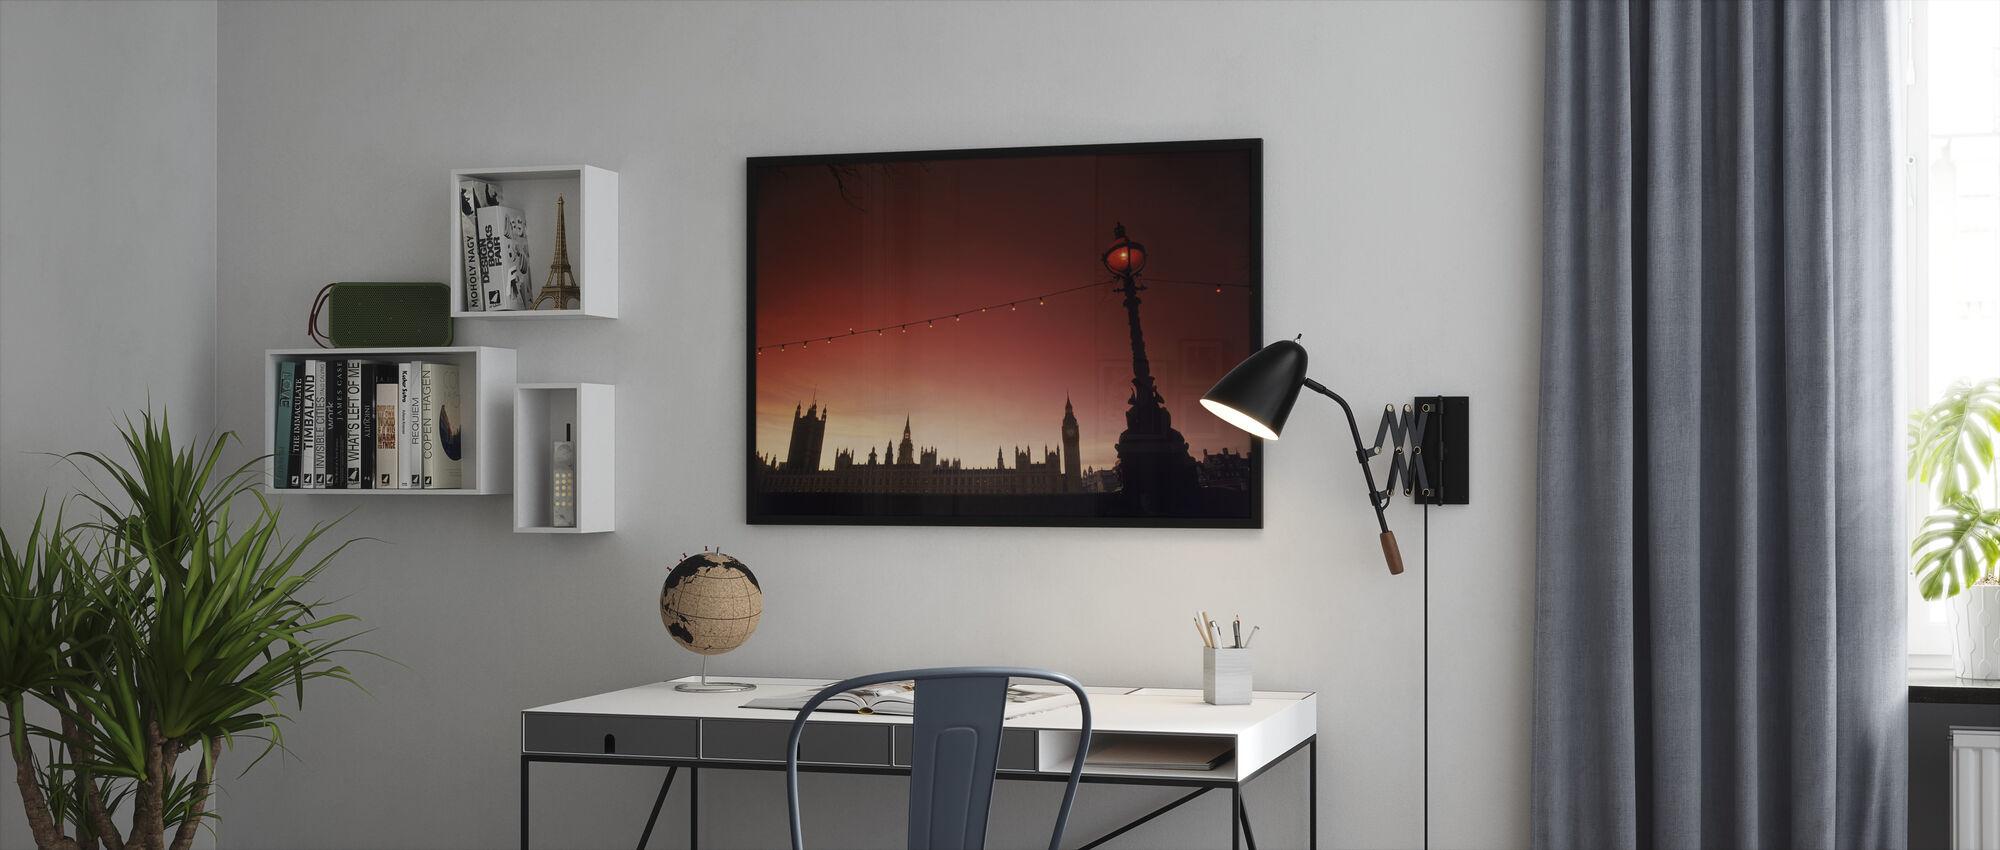 A Study in Scarlet, London - Framed print - Office